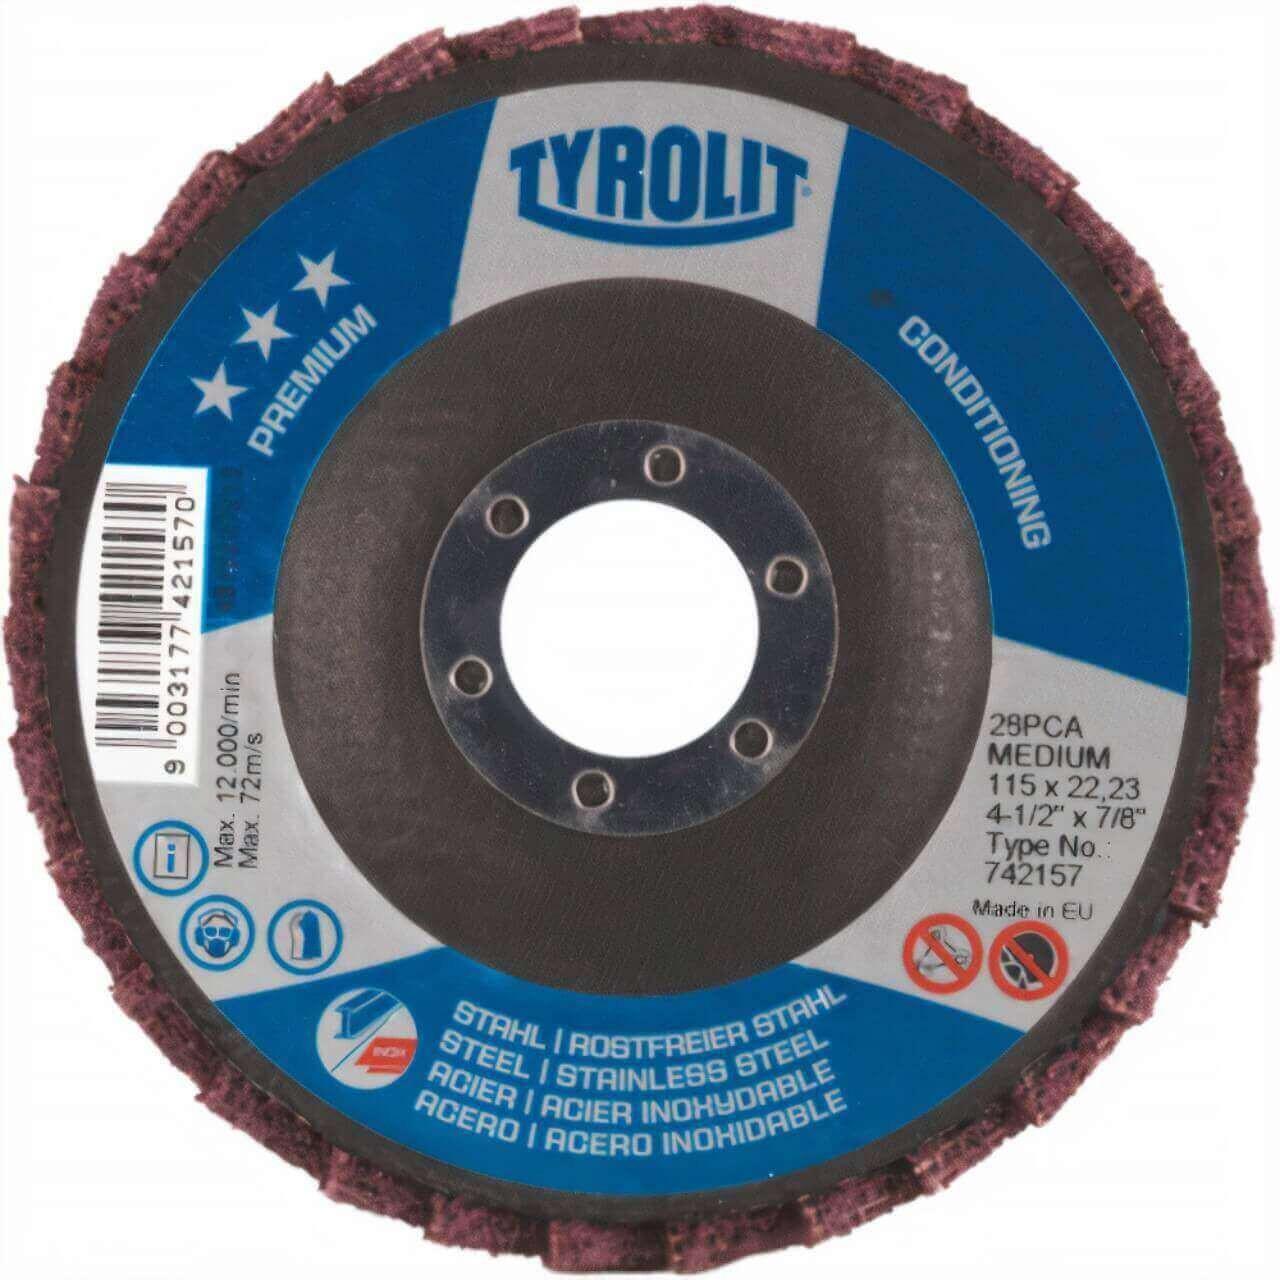 Tyrolit 125x22 120g SCM Combi Premium Flap Disc